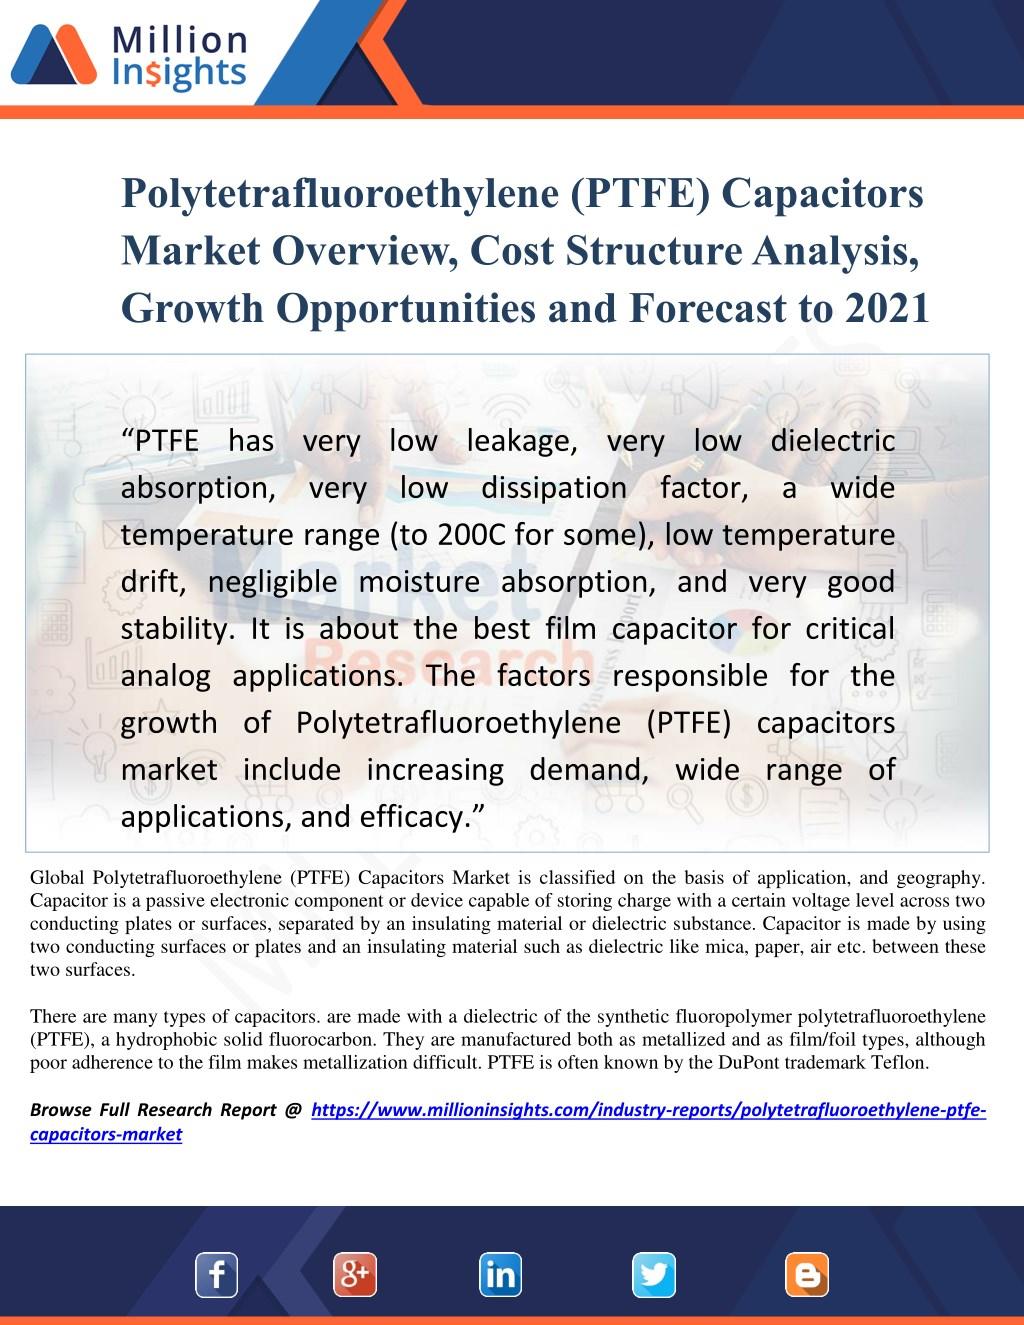 PPT - Polytetrafluoroethylene (PTFE) Capacitors Market Overview